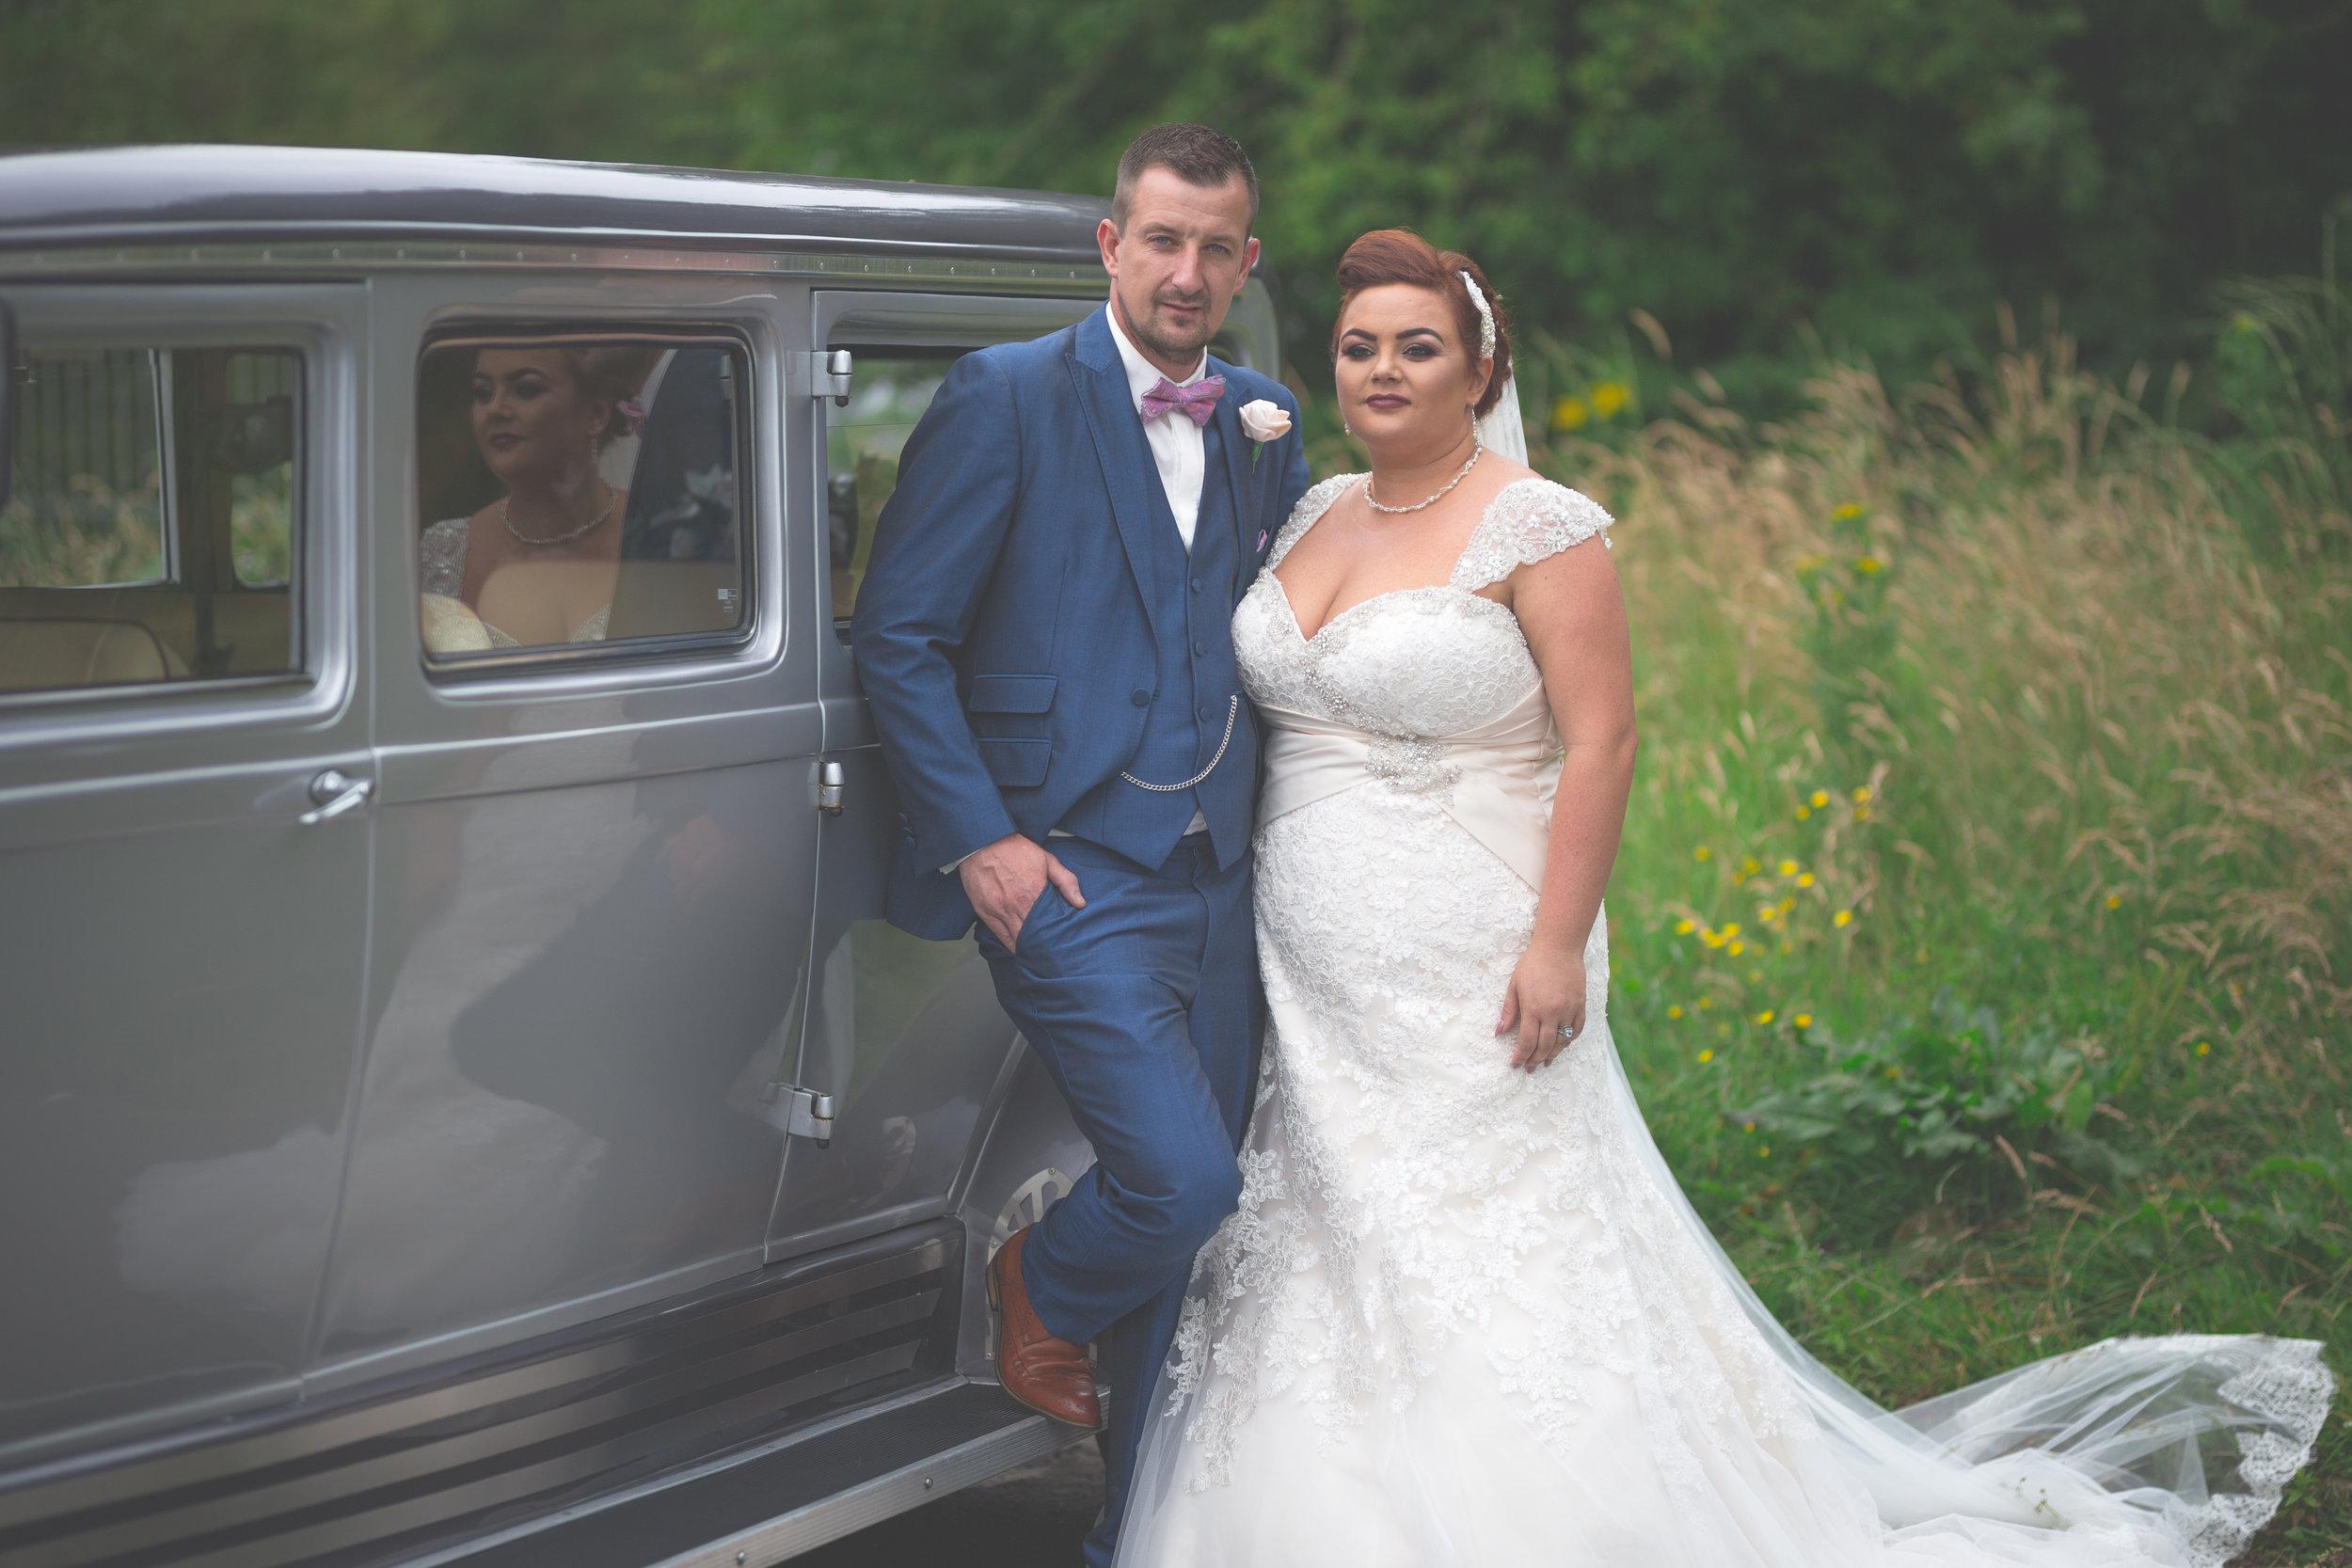 Antoinette & Stephen - Portraits   Brian McEwan Photography   Wedding Photographer Northern Ireland 33.jpg